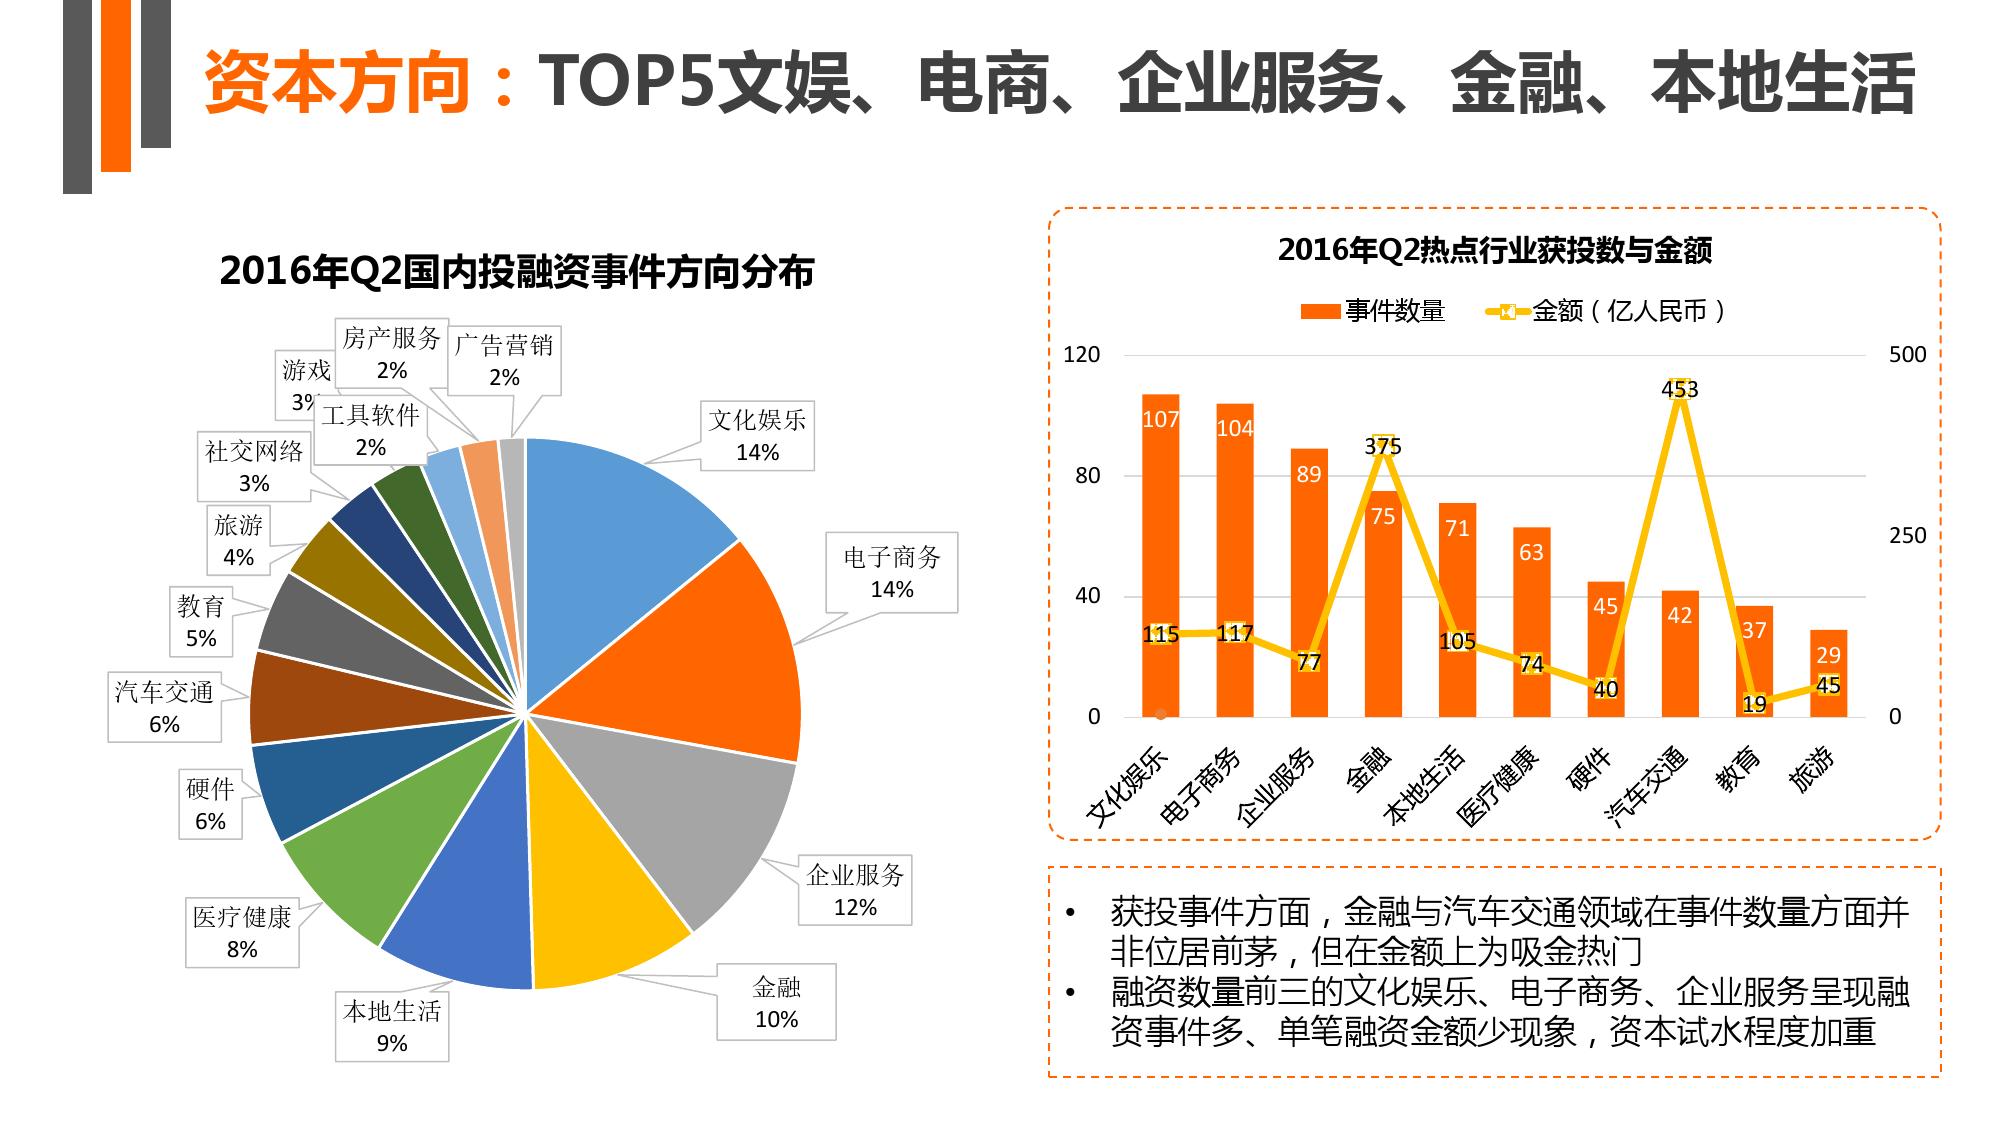 【IT桔子】2016年Q2中国互联网创业投资分析报告_000014